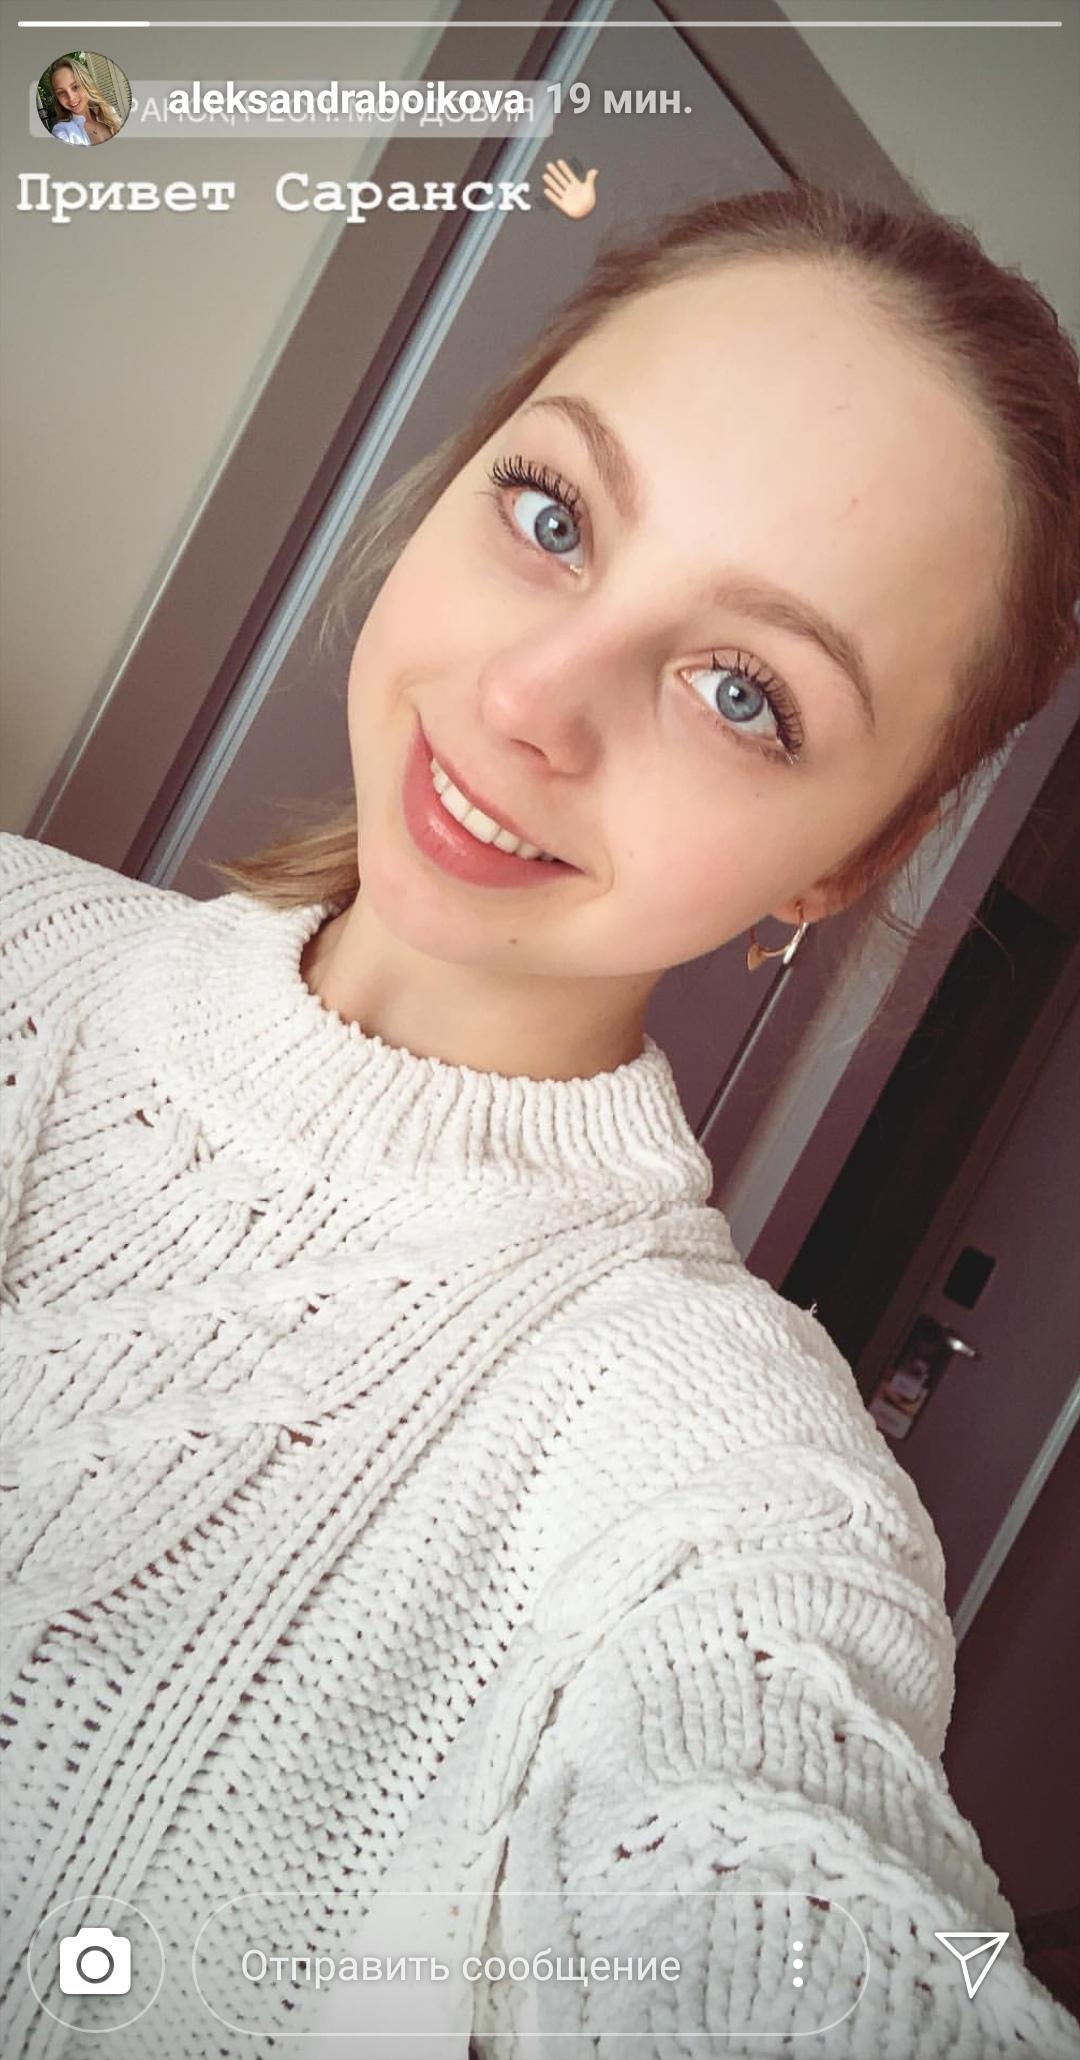 Александра Бойкова-Дмитрий Козловский - Страница 13 NUBNs